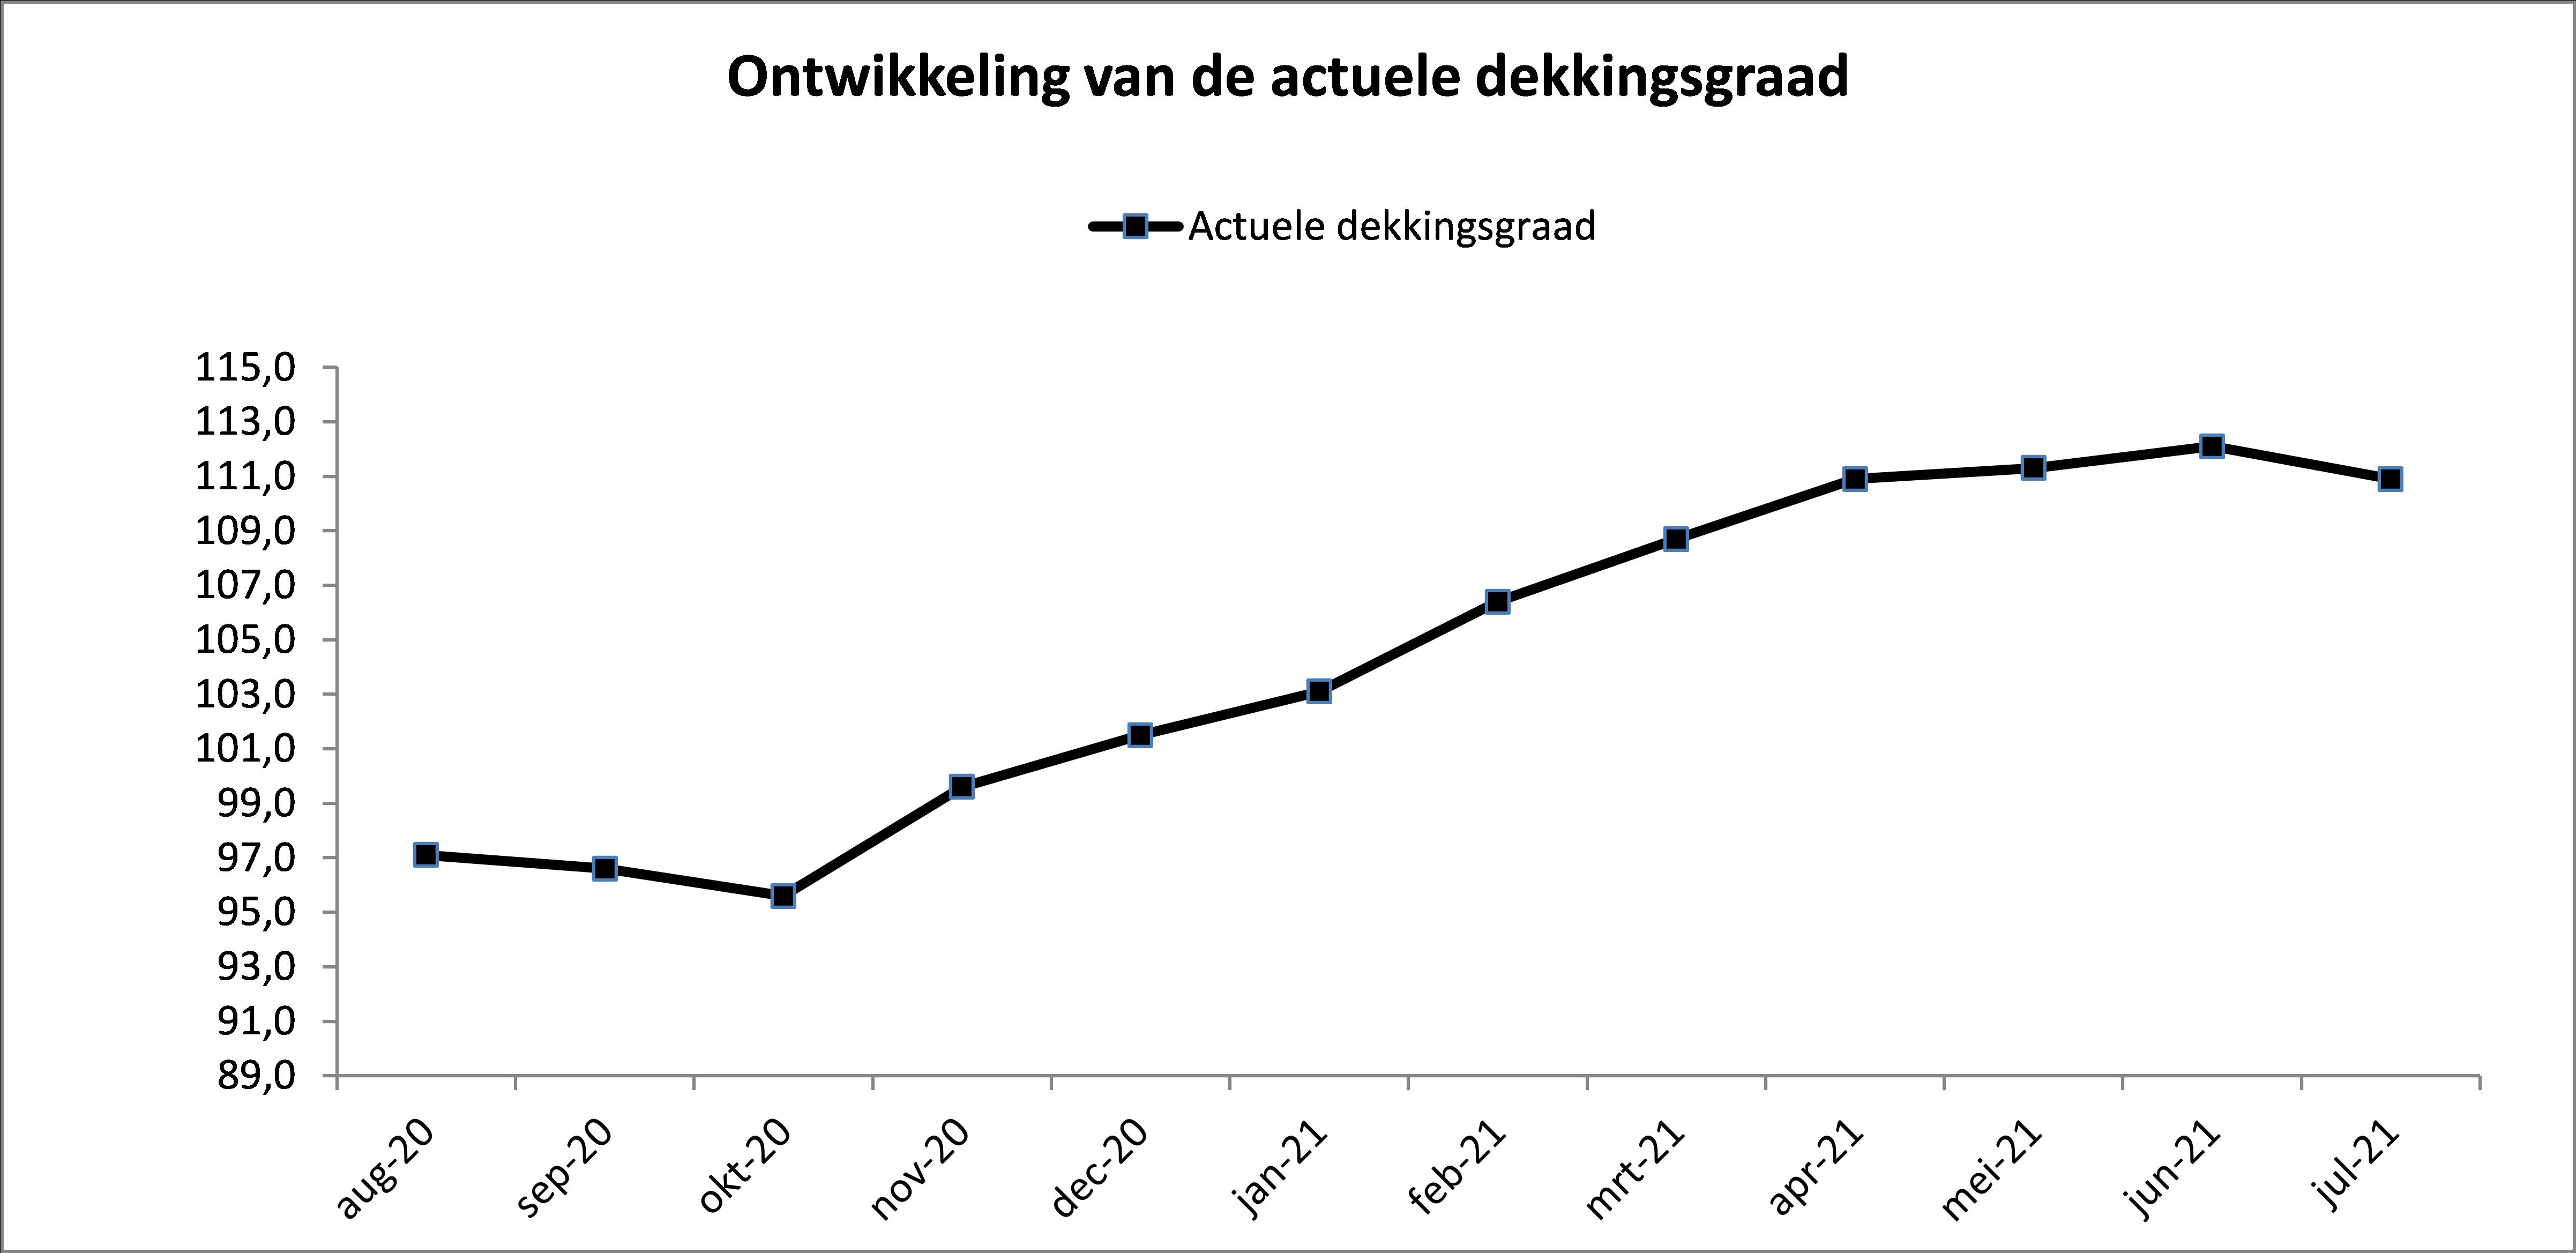 verloop actuele dekkingsgraad APF tot en met juli 2021